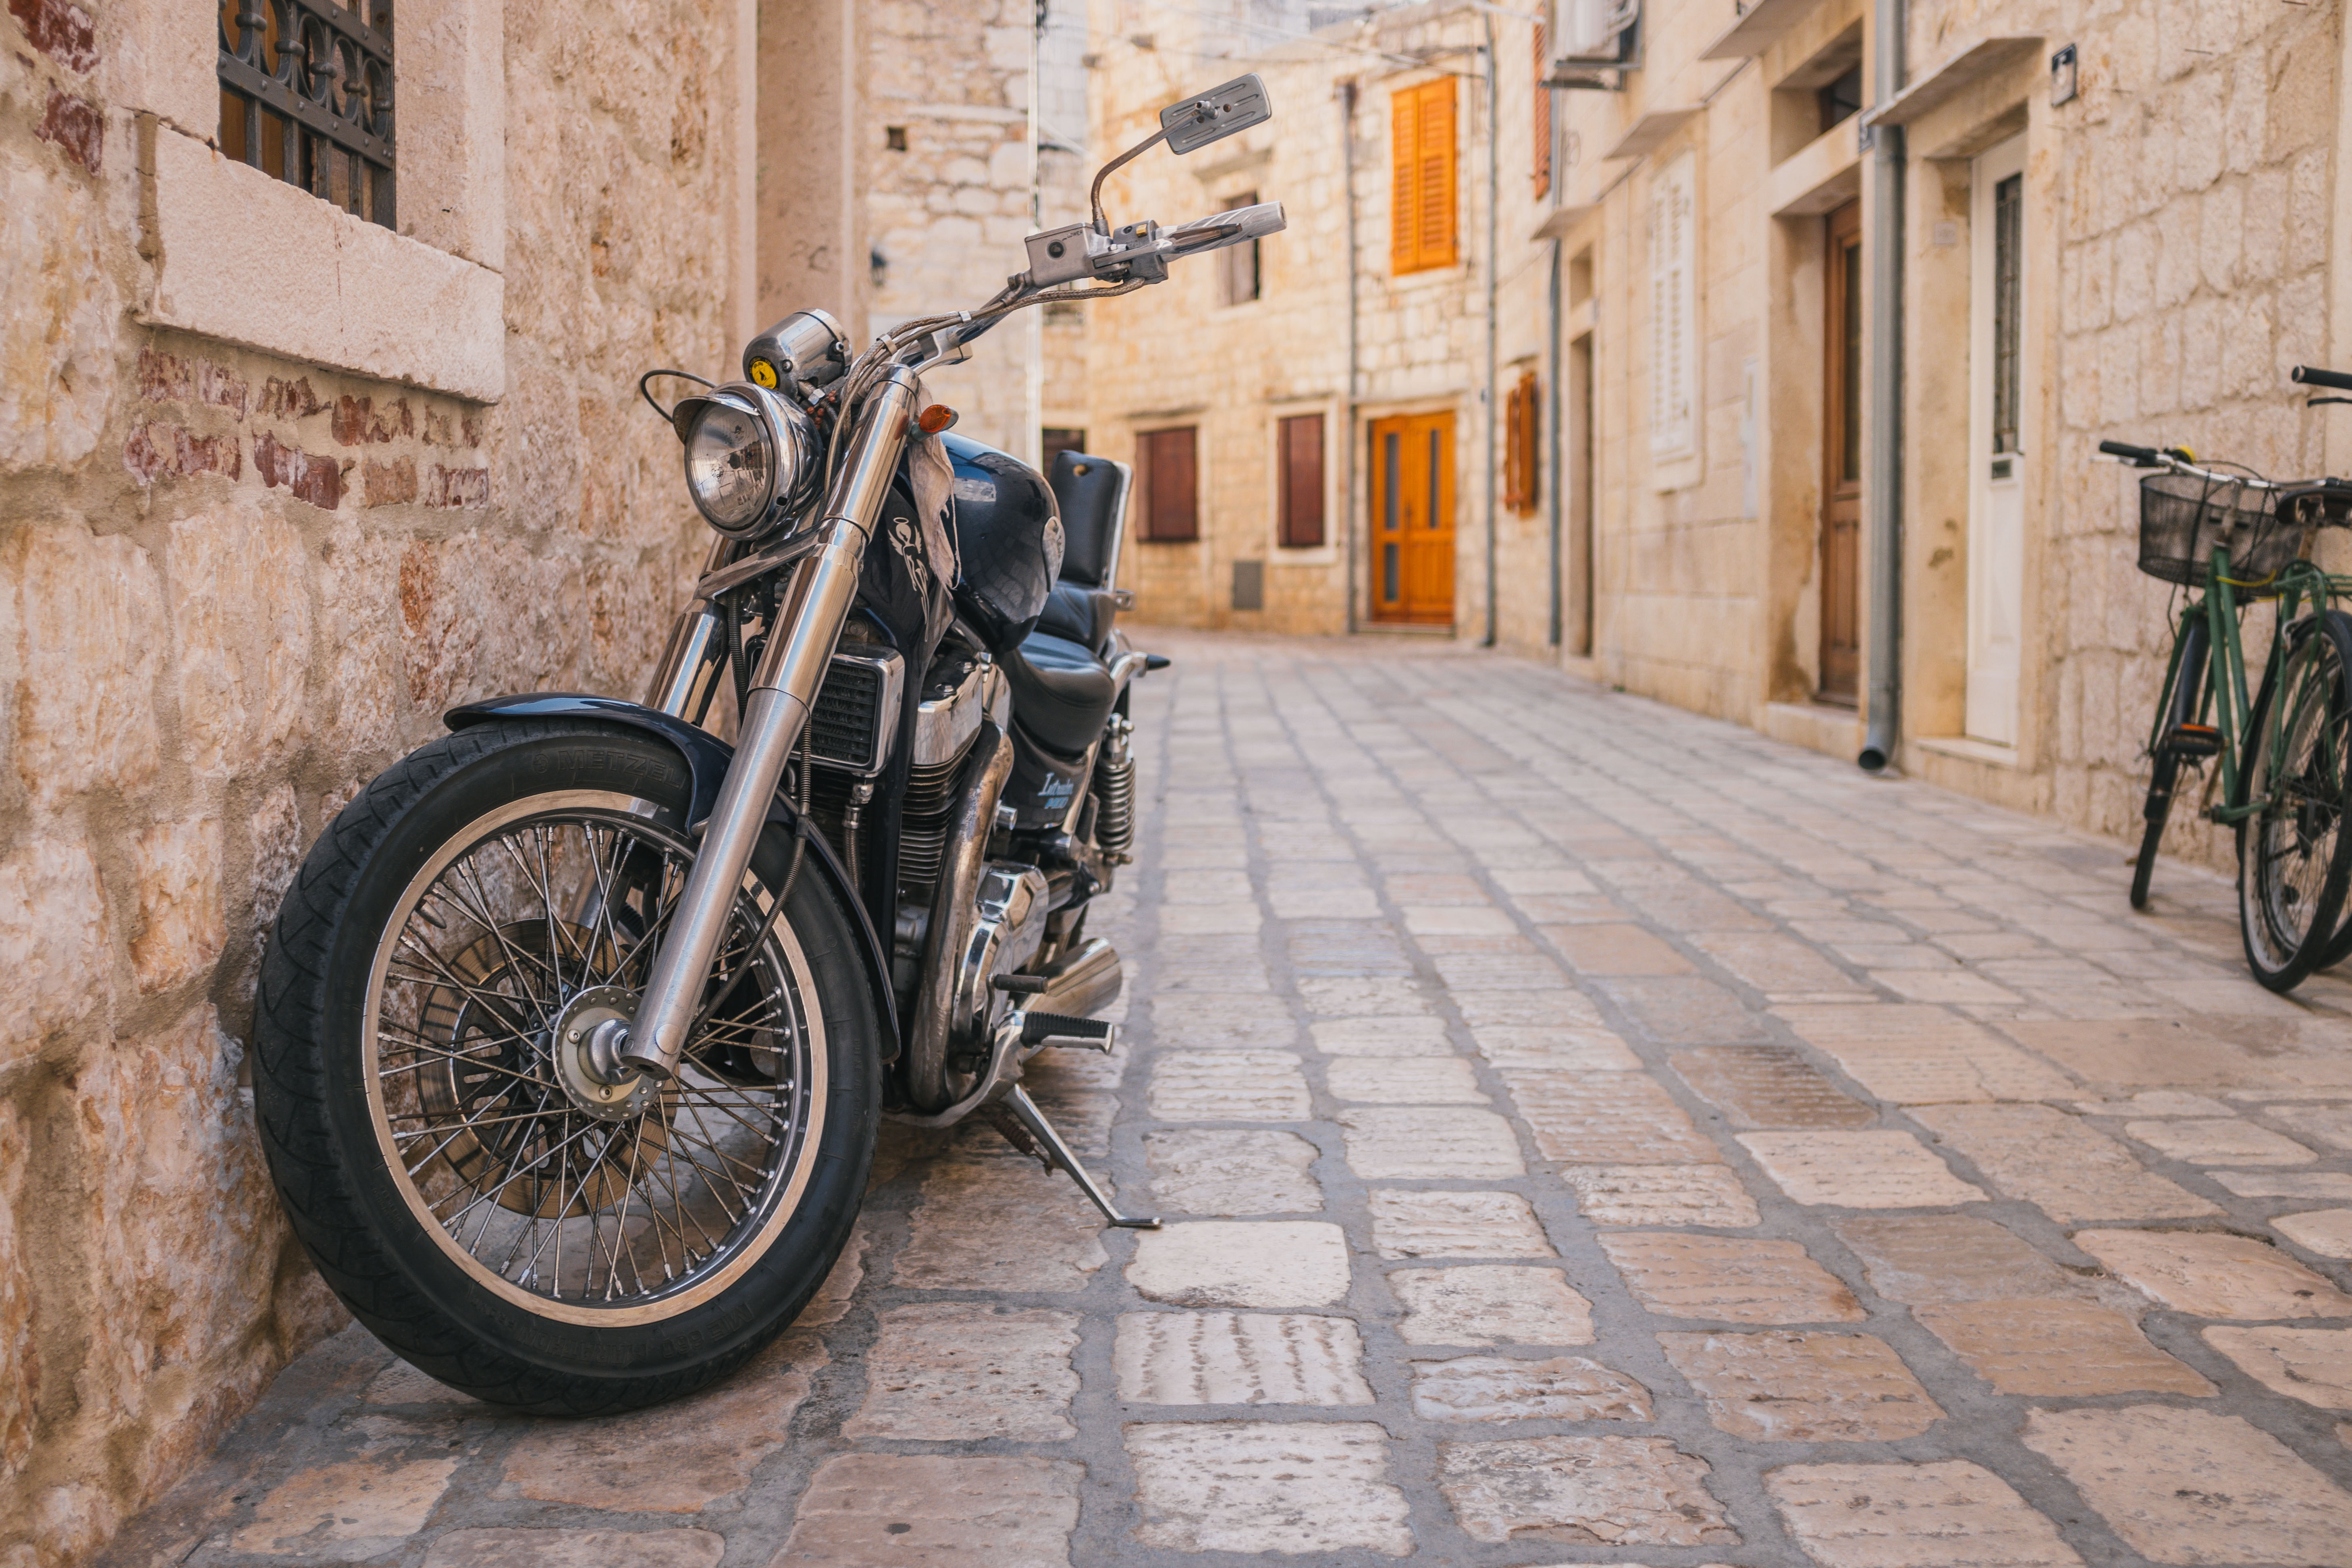 Travel by motorcycle in Hvar, Croatia